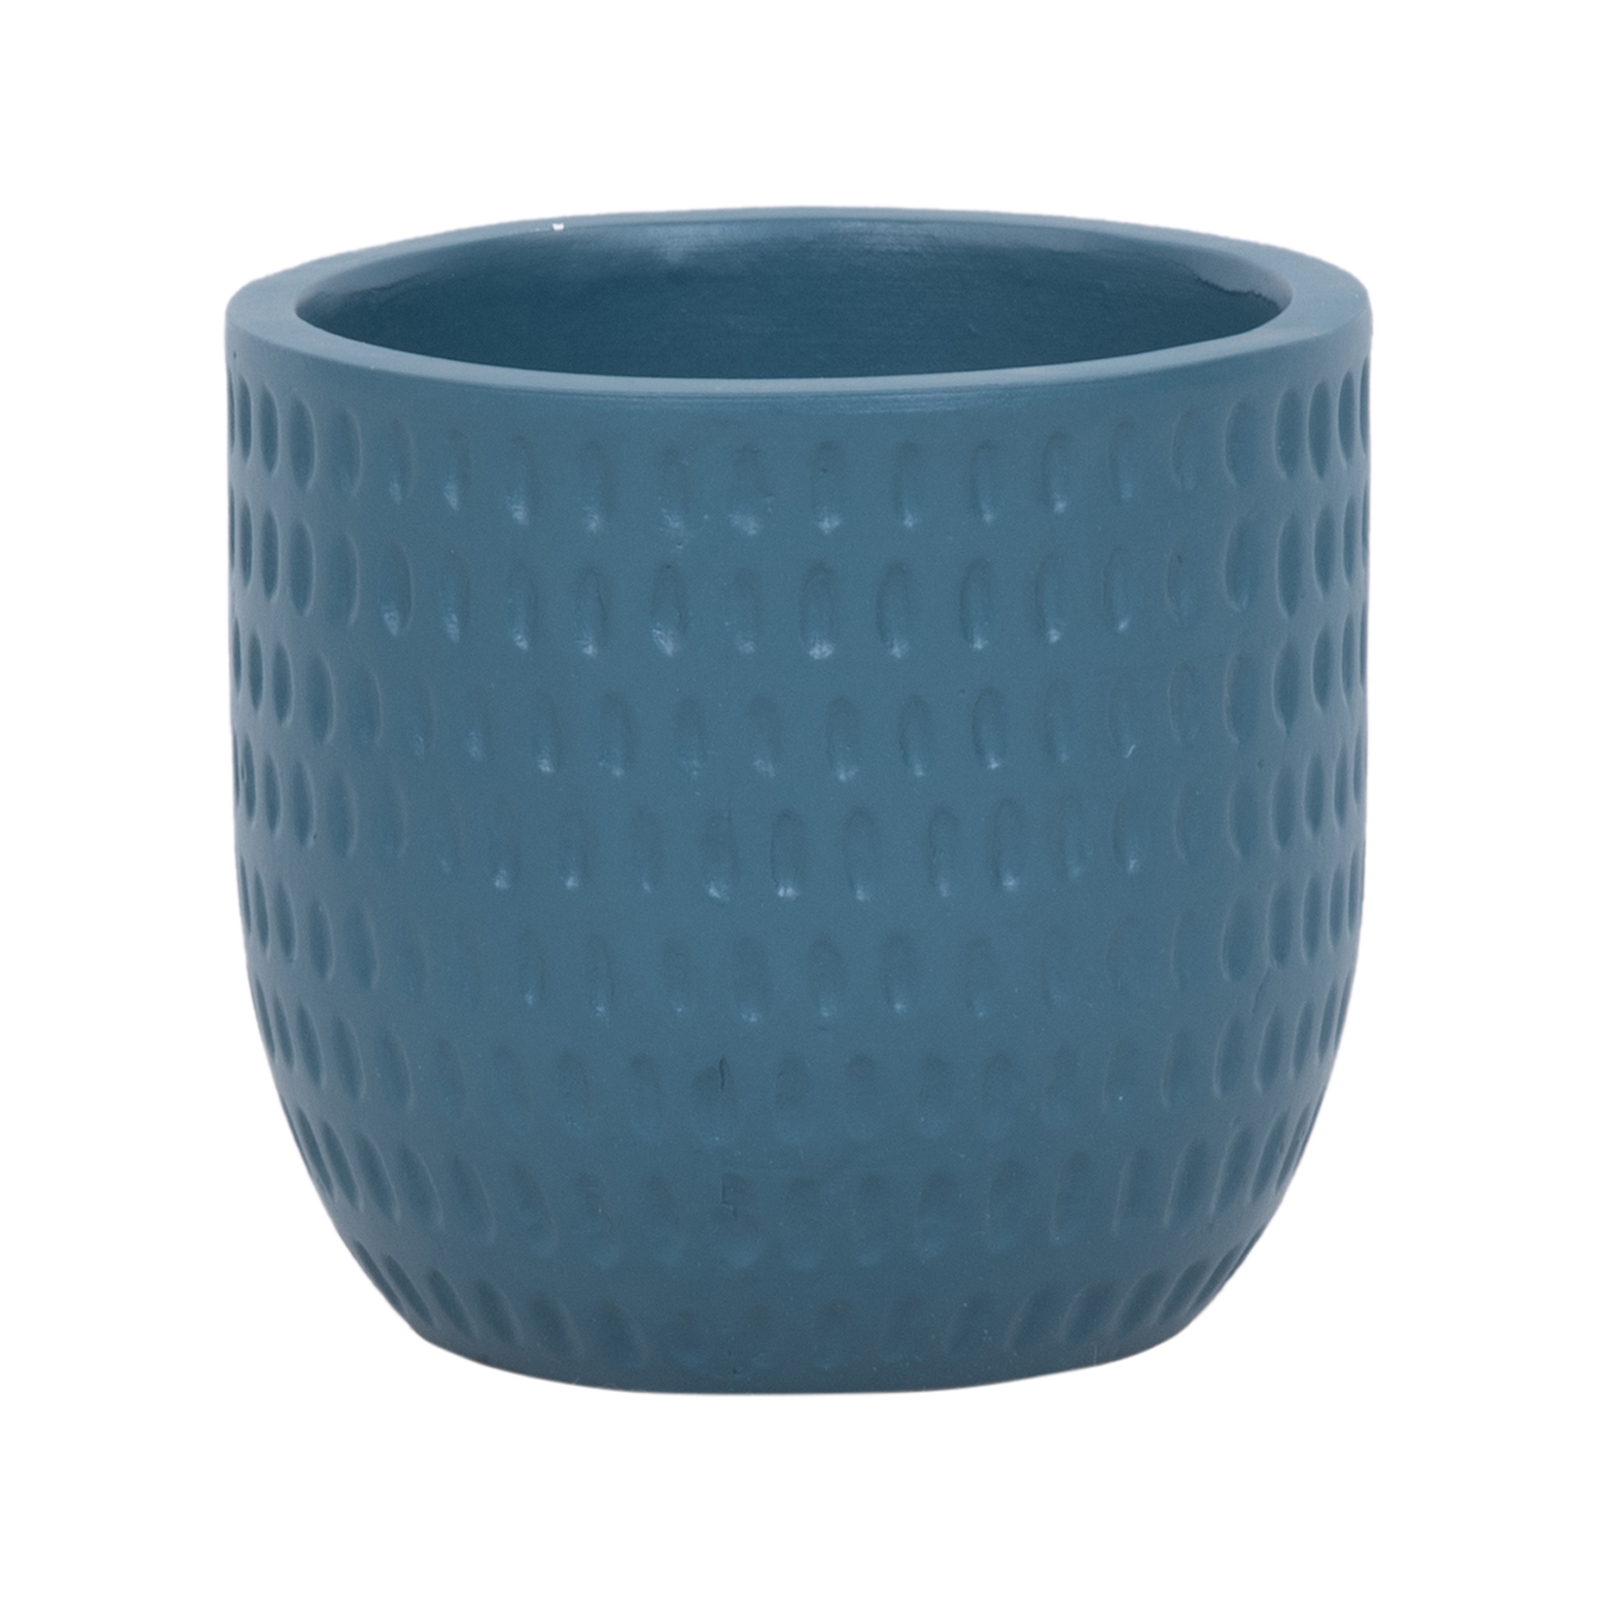 Lotus 18 x 16cm Navy Medium Dotty Ceramic Egg Pot